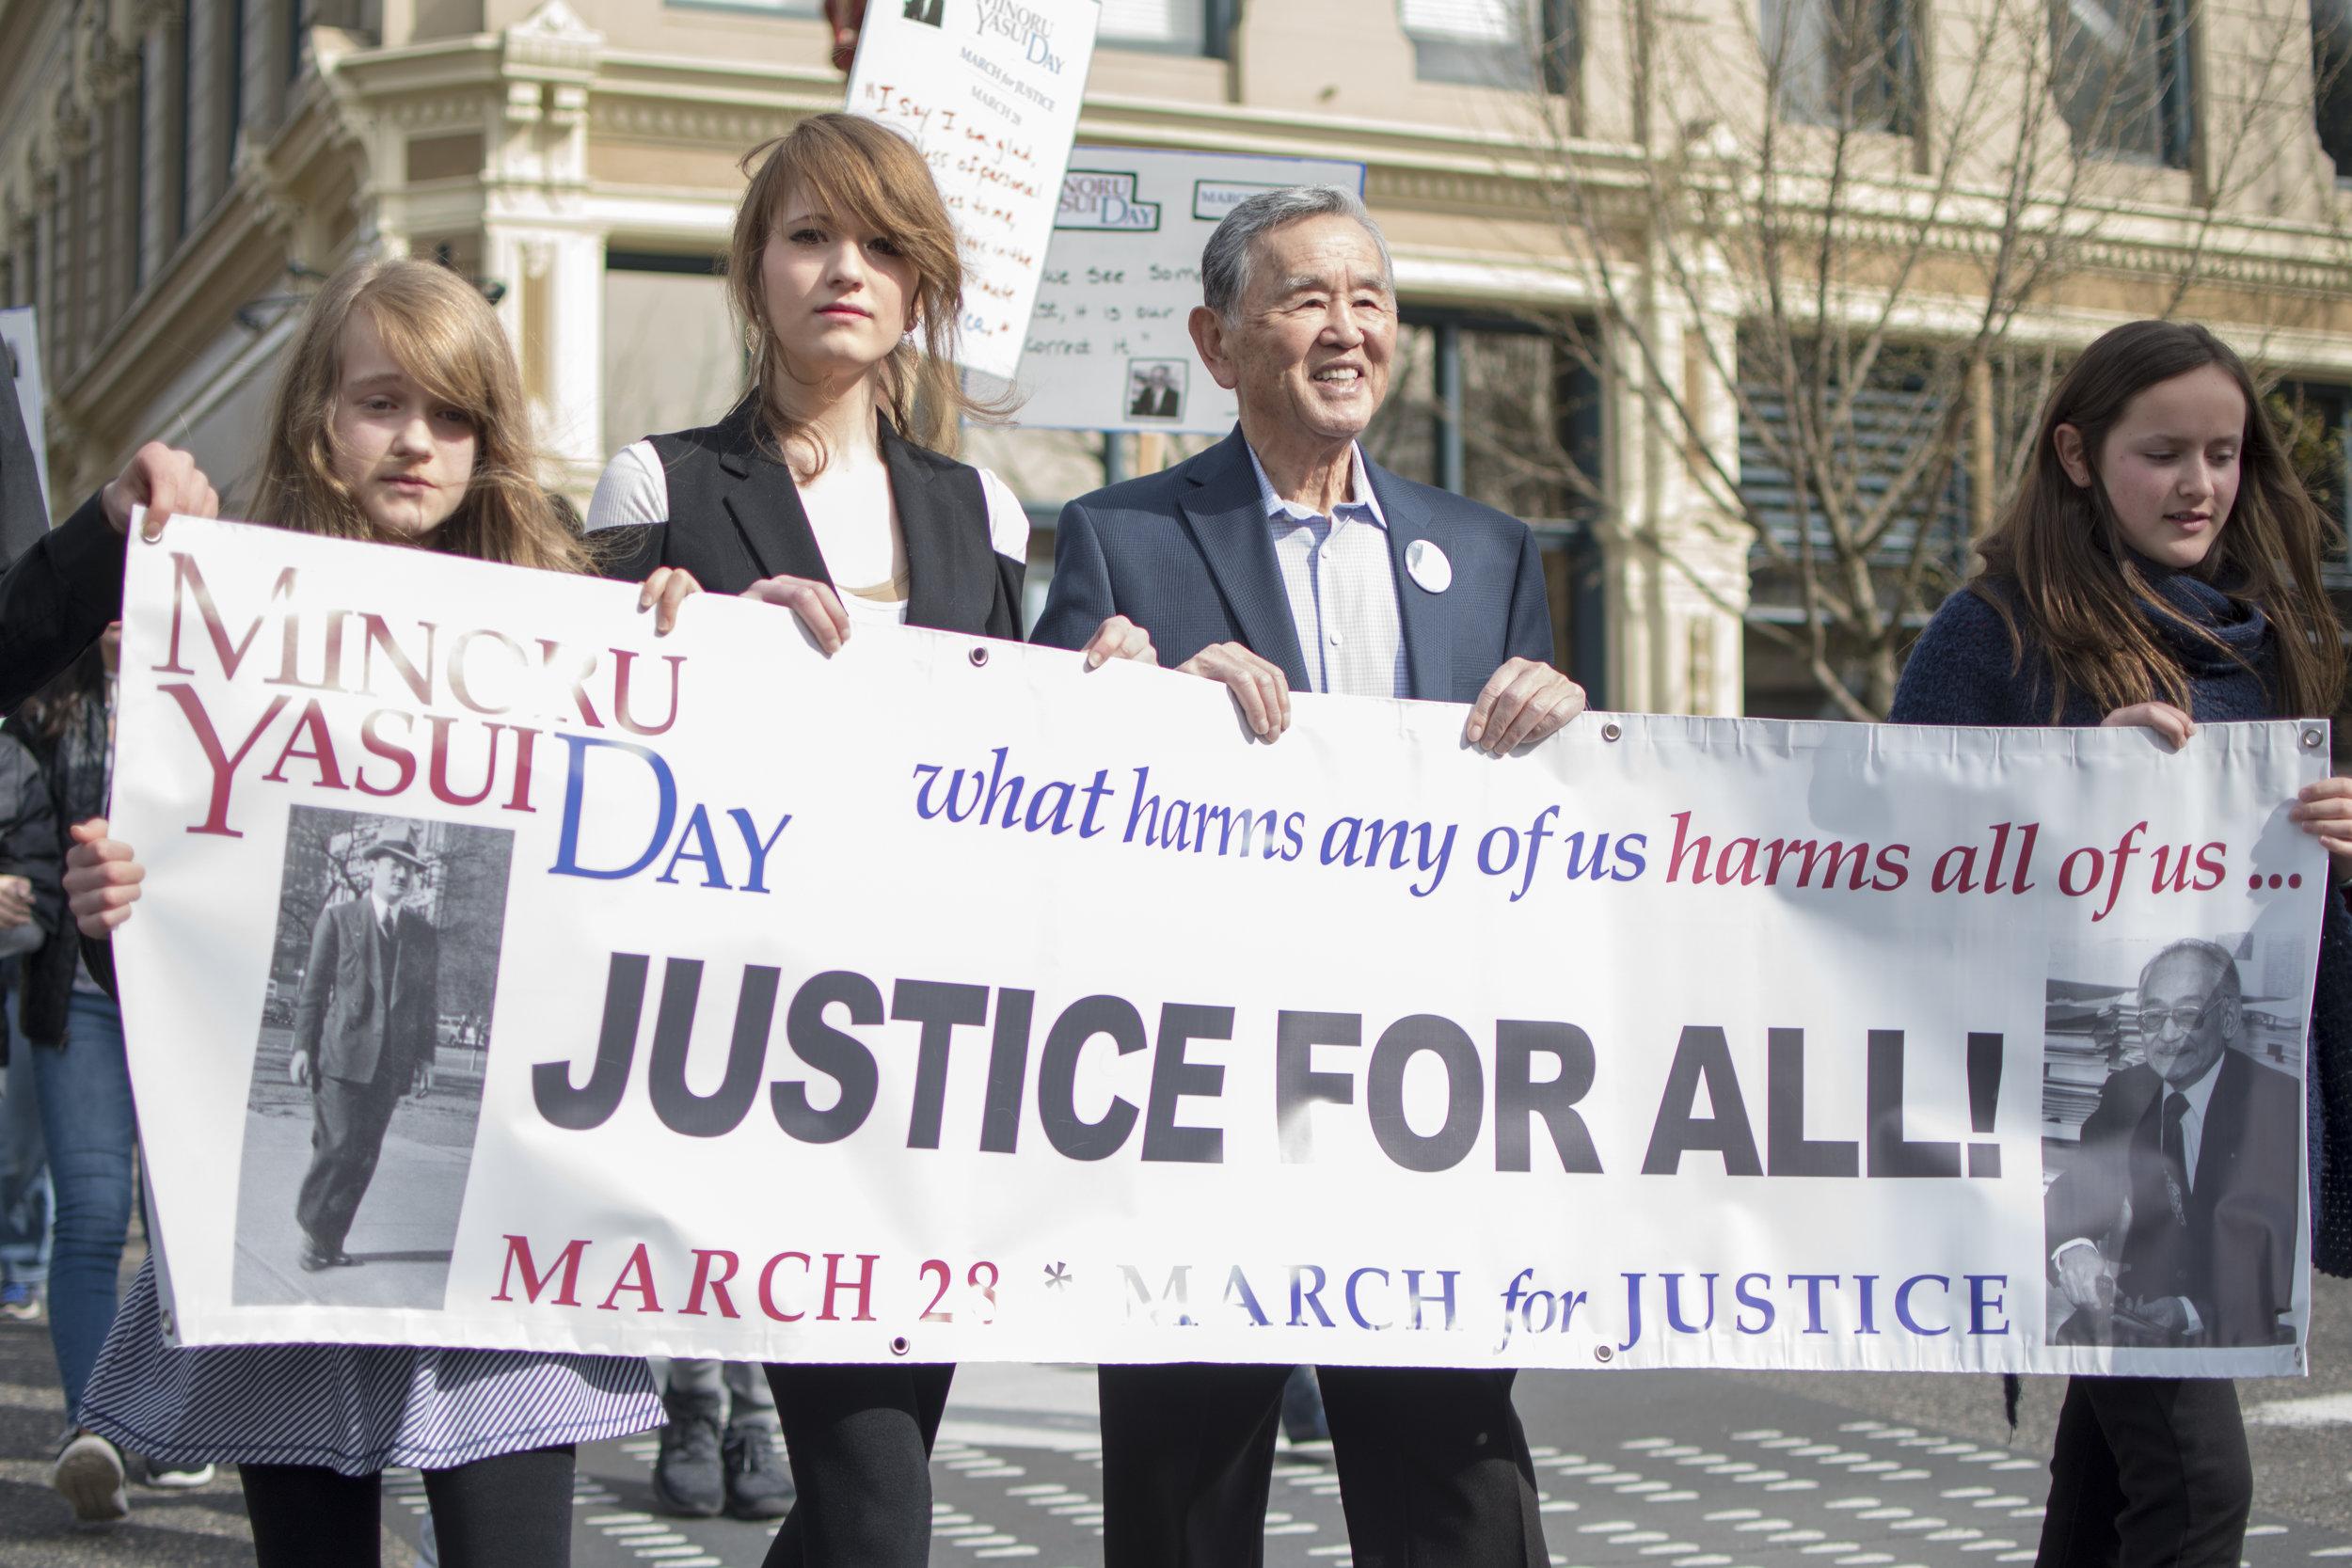 Minoru Yasui Day in Portland